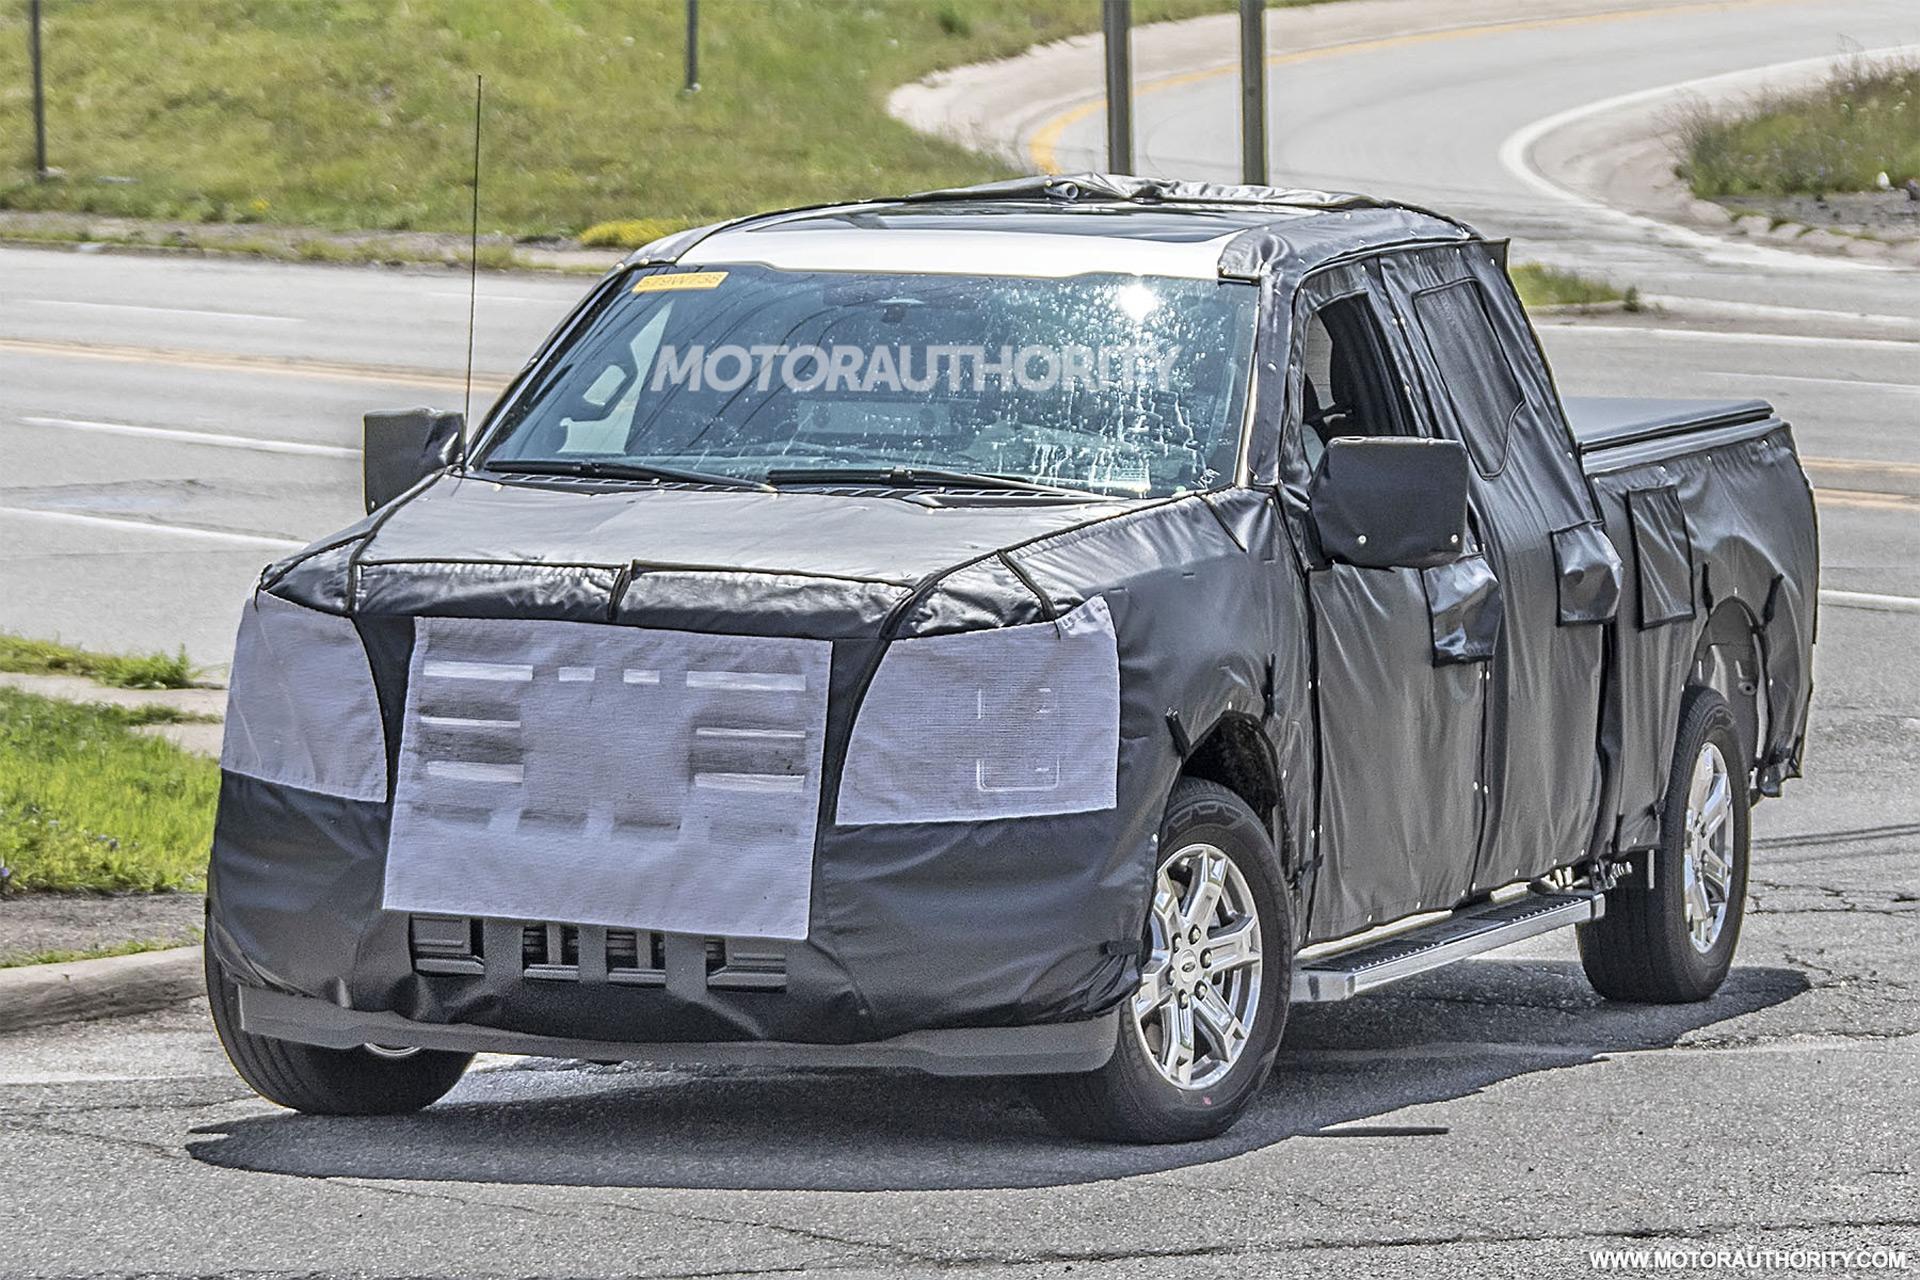 2020 - [Ford] F-Series 2021-ford-f-150-spy-shots--image-via-s-baldauf-sb-medien_100710857_h